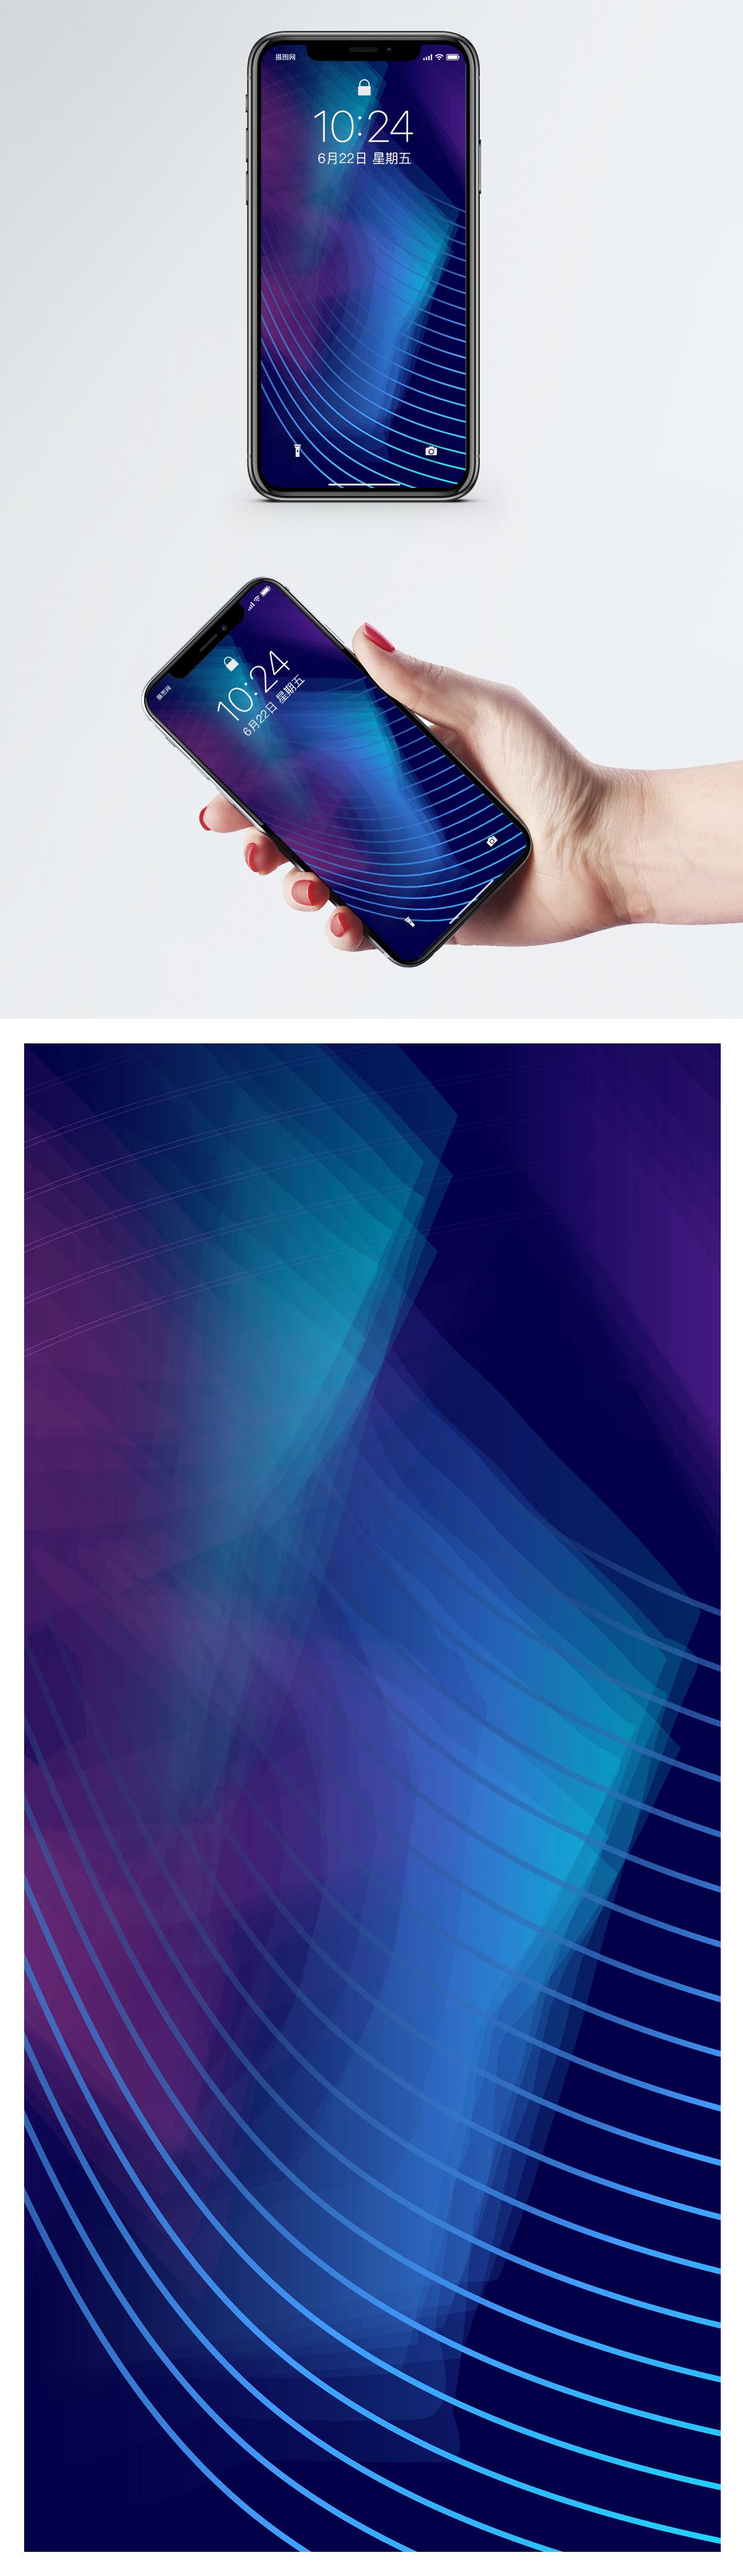 Cool Background Mobile Wallpaper Backgrounds Images Free Download 400877414 Lovepik Com